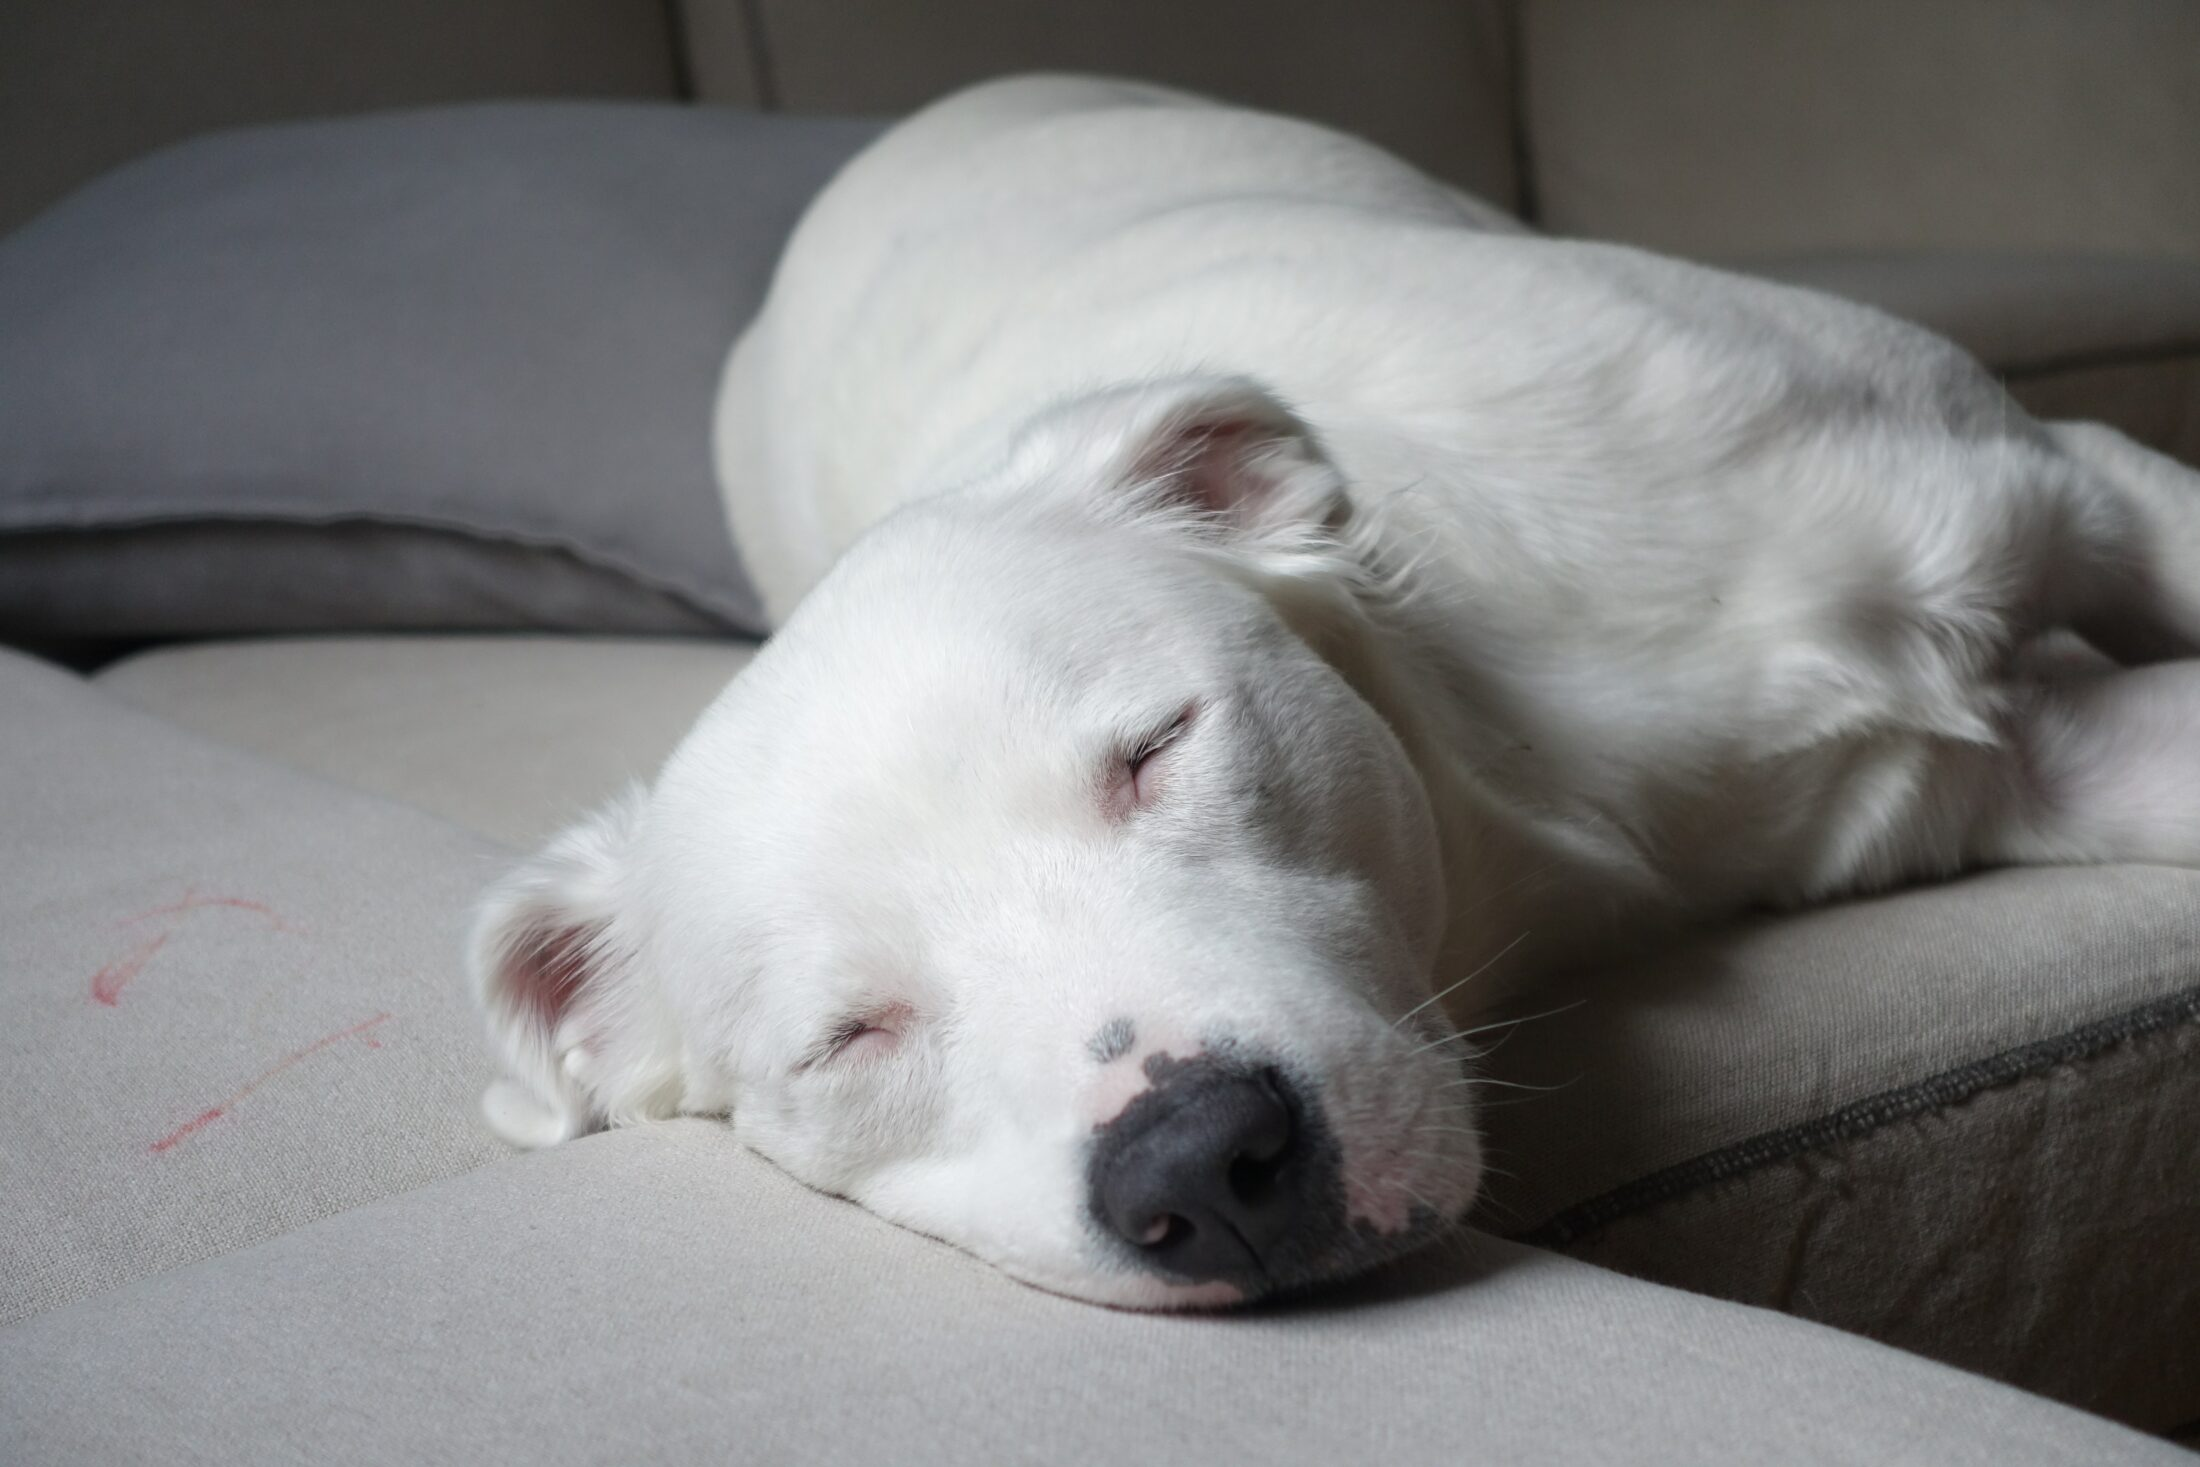 Cachorro medio porte - am staff terrier